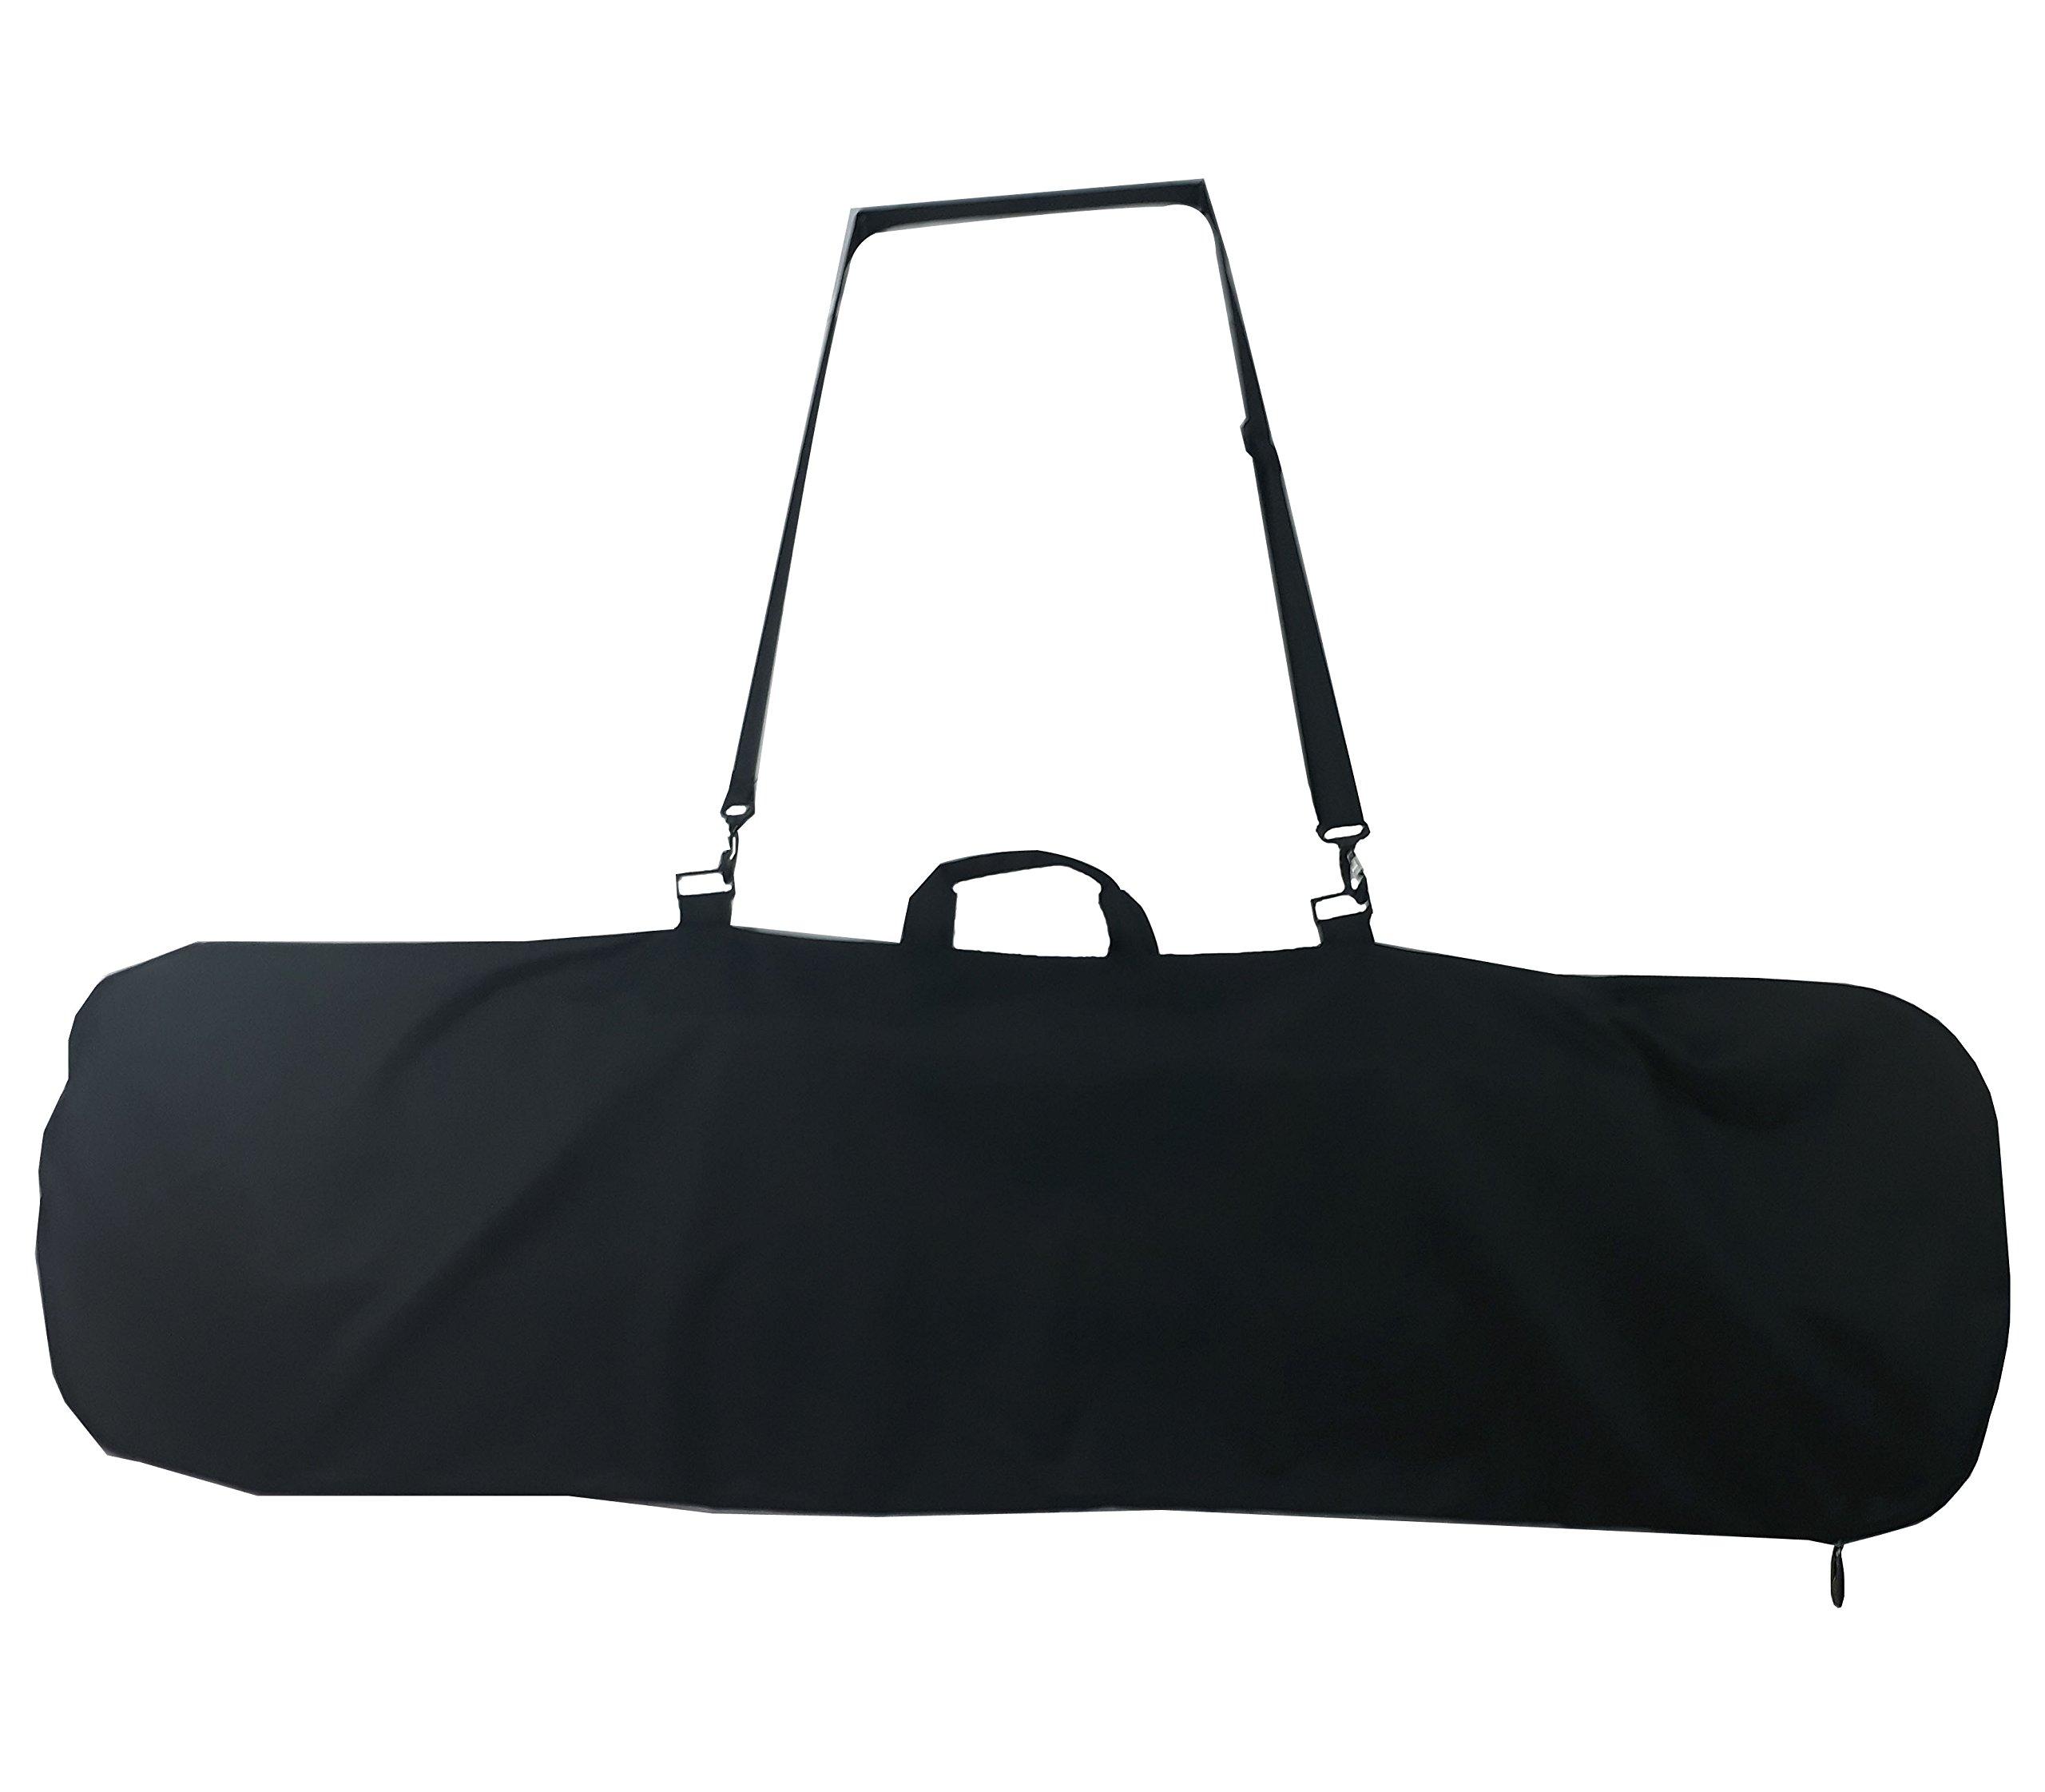 Axiboard Snowboard Bag, Board Sleeve Black 55 inch bag for Smaller Boards Youth. Kids Snowboard Bag. by Axiboard